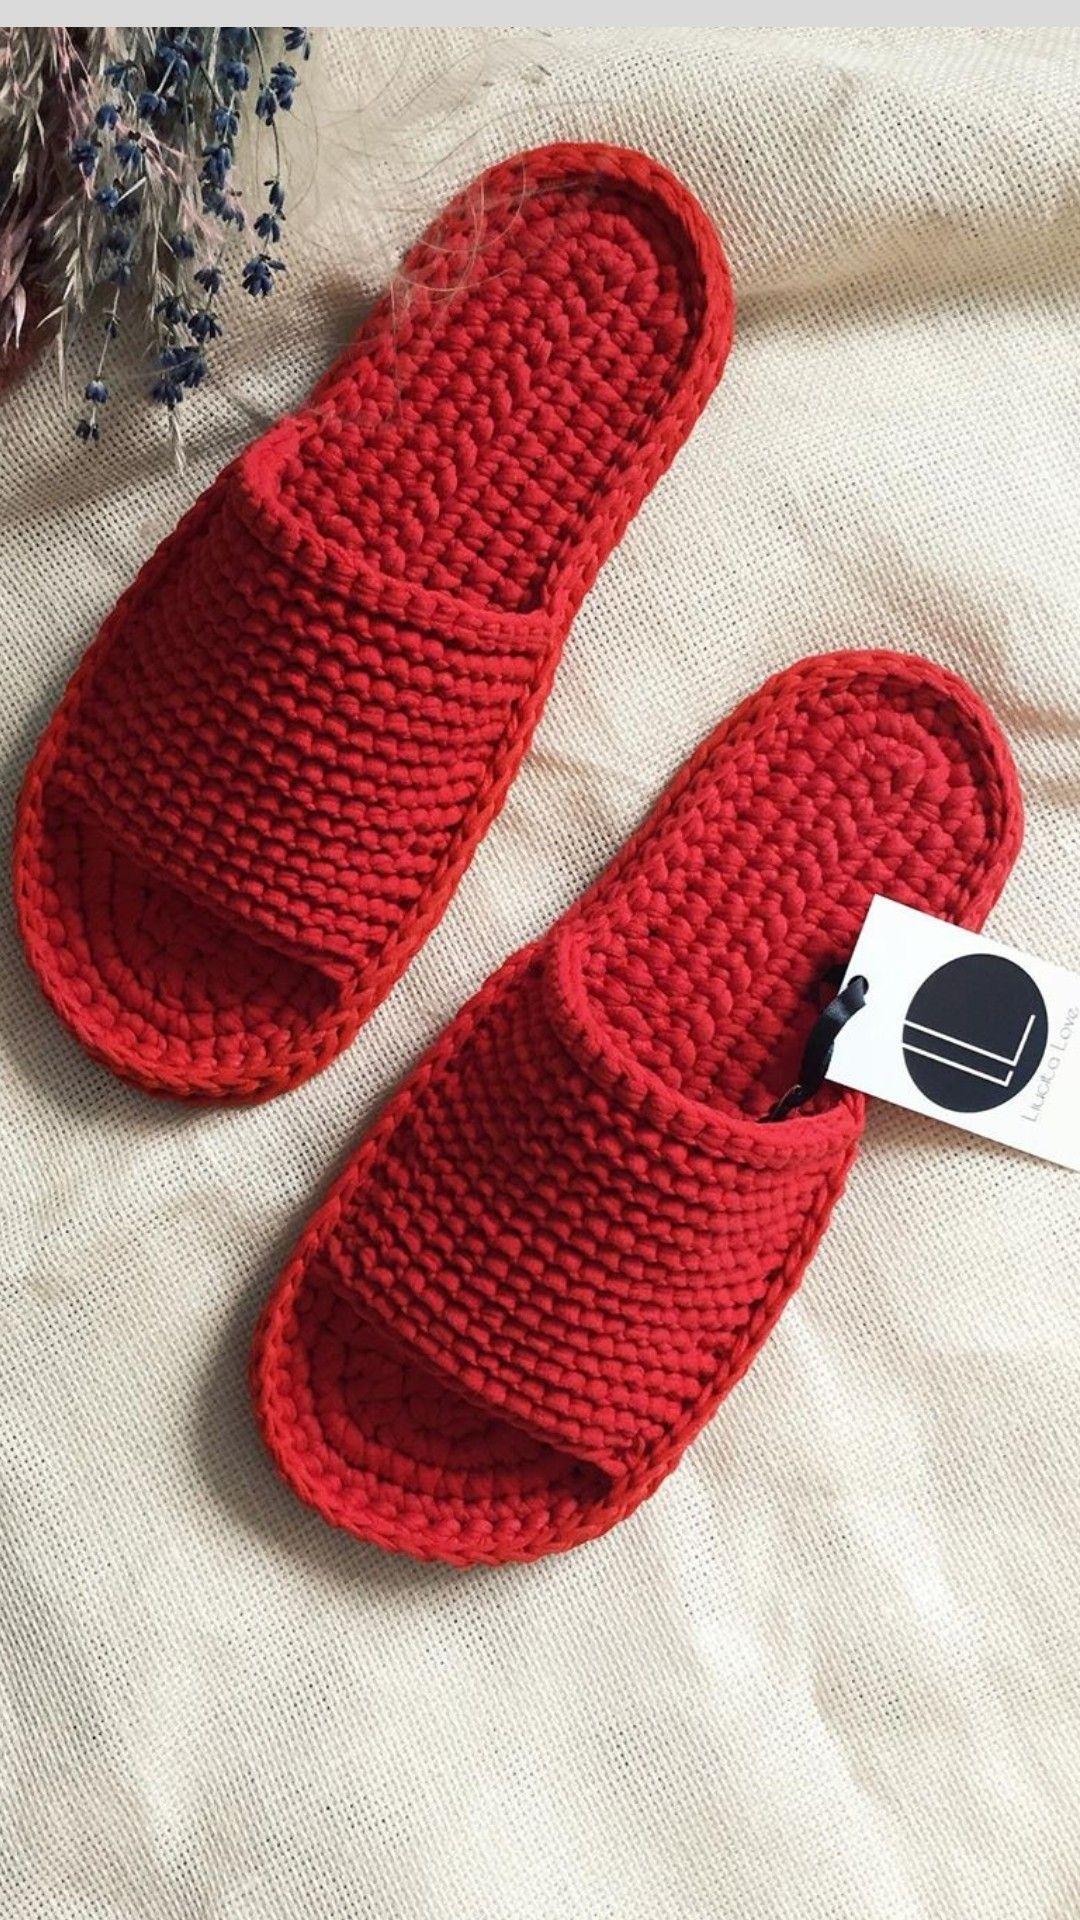 Photo of Crochet slippers